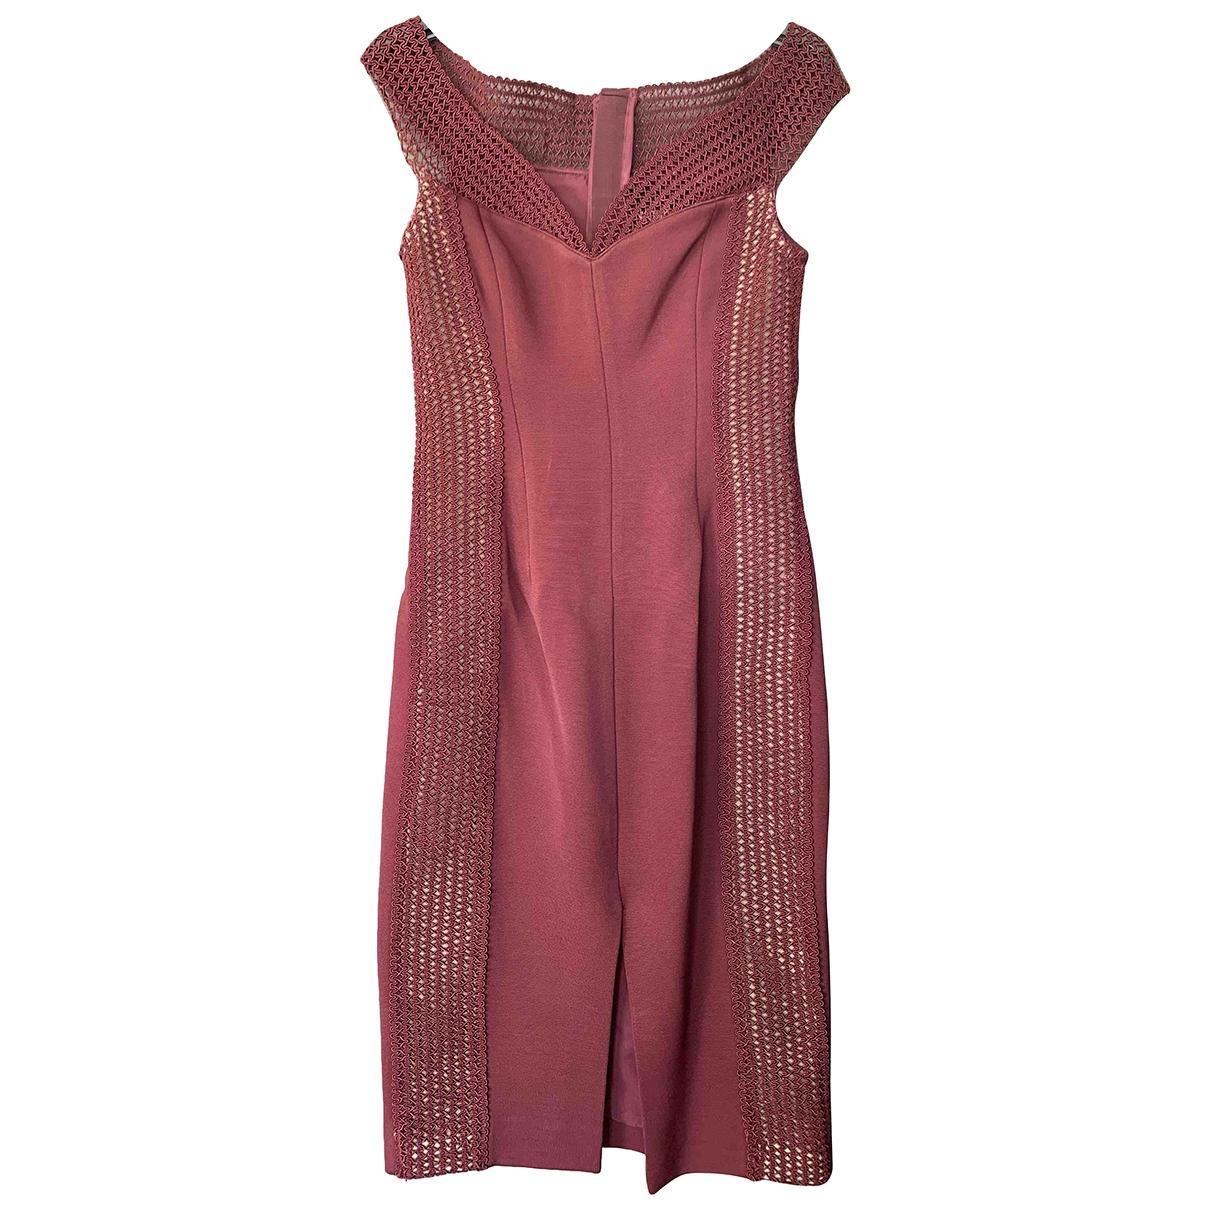 Nicholas \N Burgundy dress for Women 8 UK